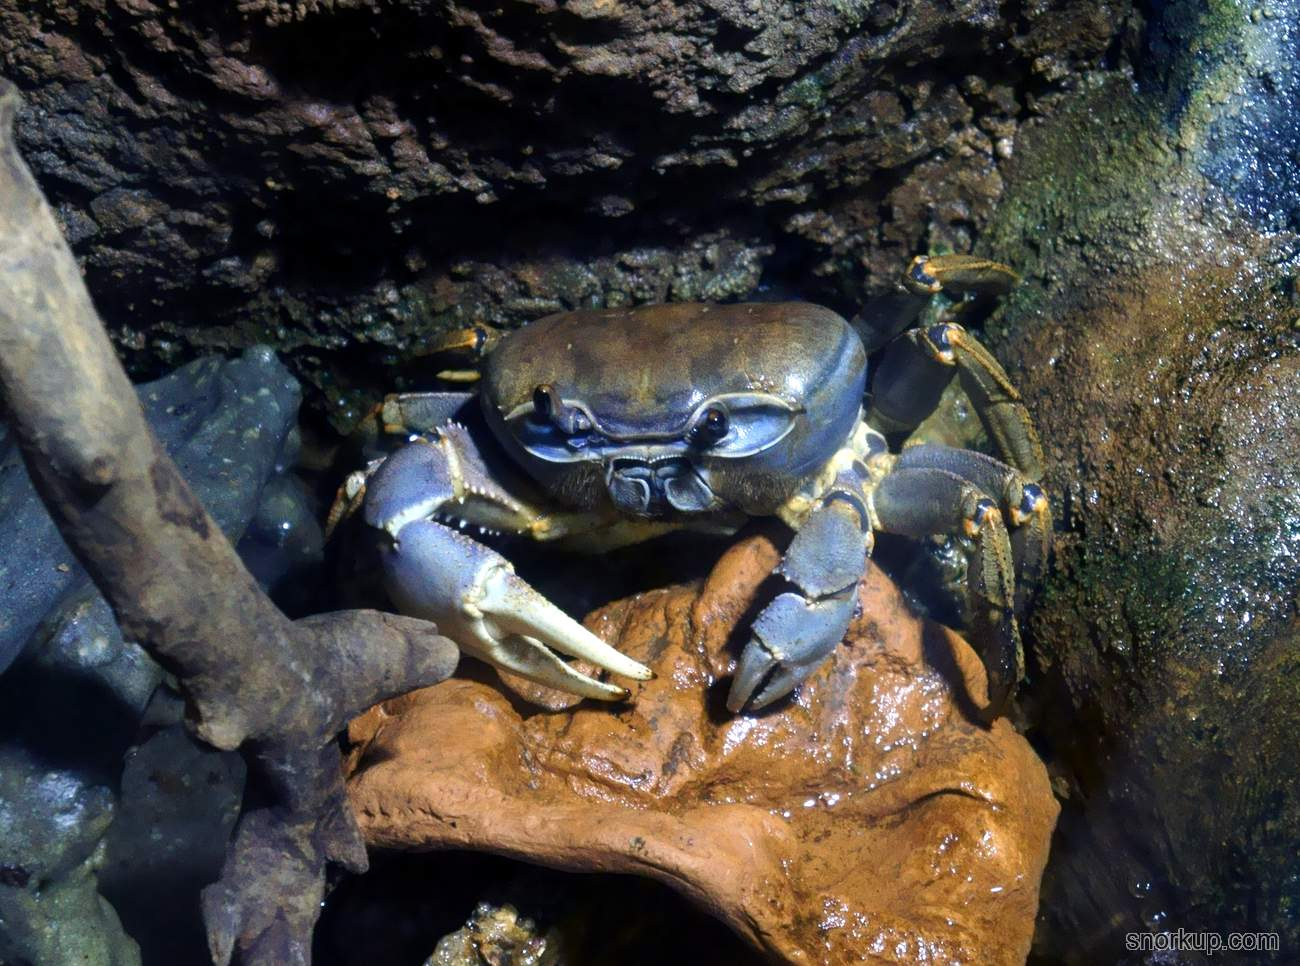 Земляной краб, Радужный краб - Cardisoma armatum - Rainbow crab